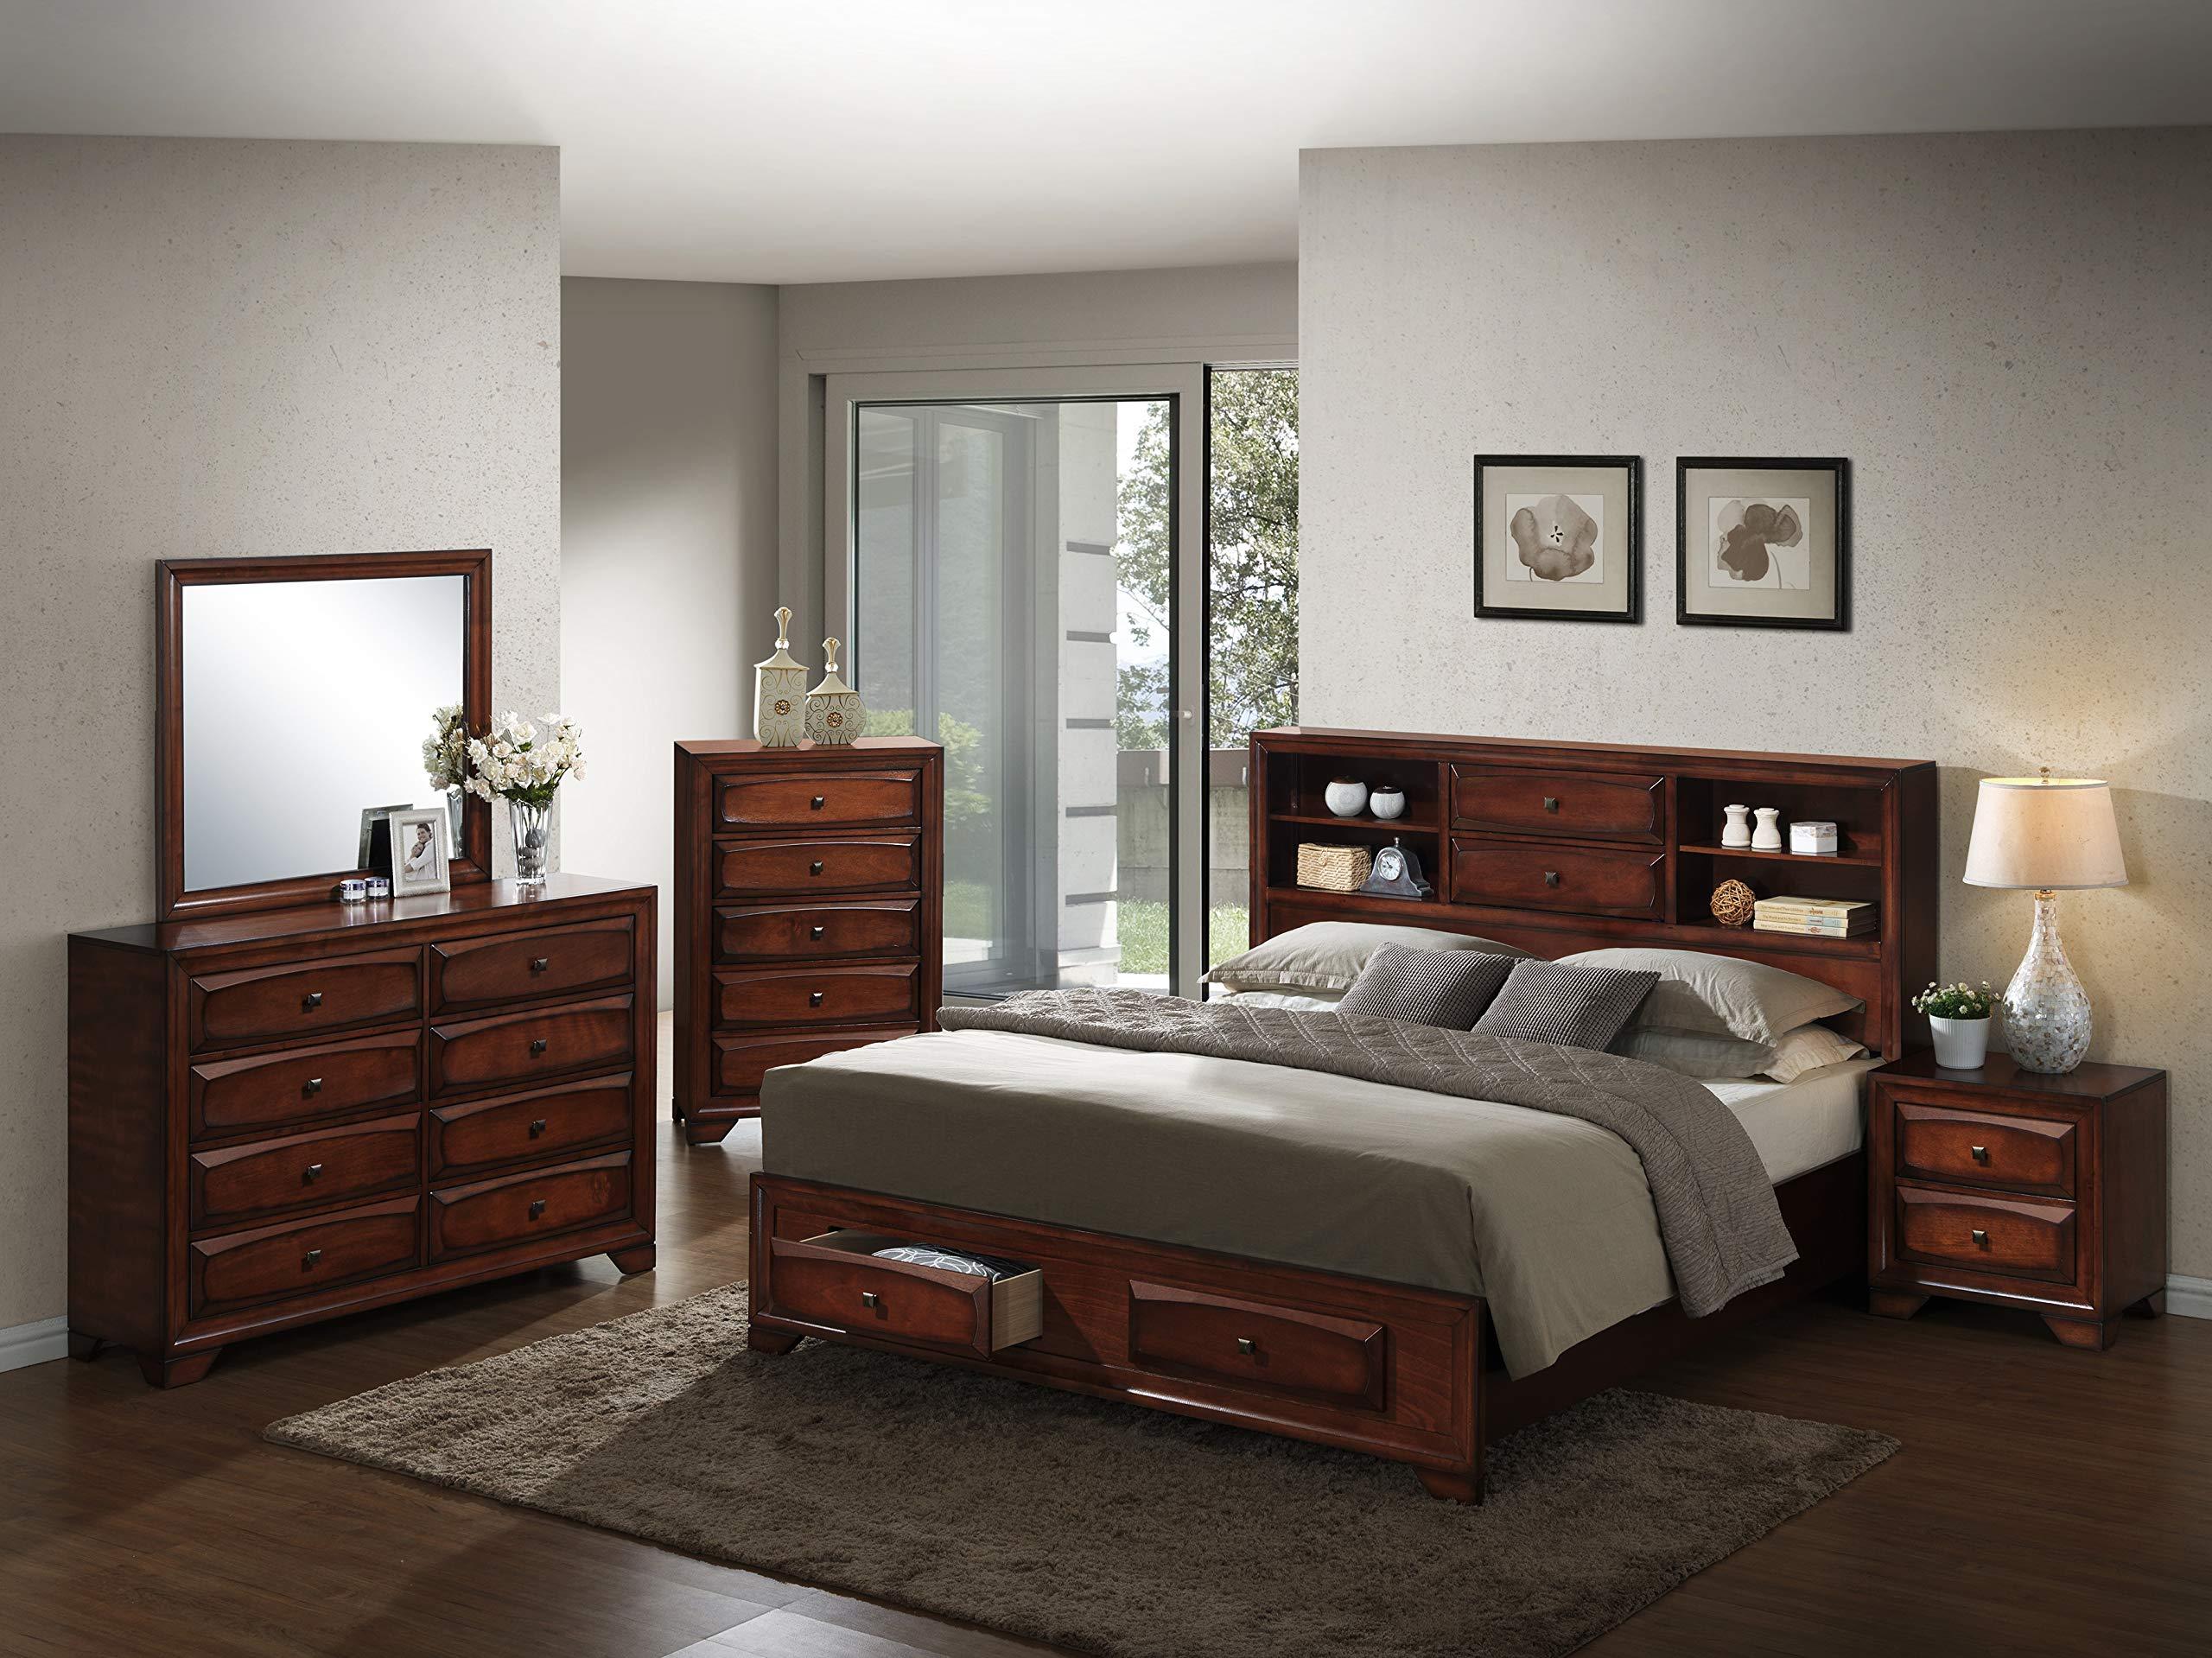 Roundhill Furniture Asger Wood Room Set, Queen Storage Bed, Dresser, Mirror, Night Stand, Chest by Roundhill Furniture